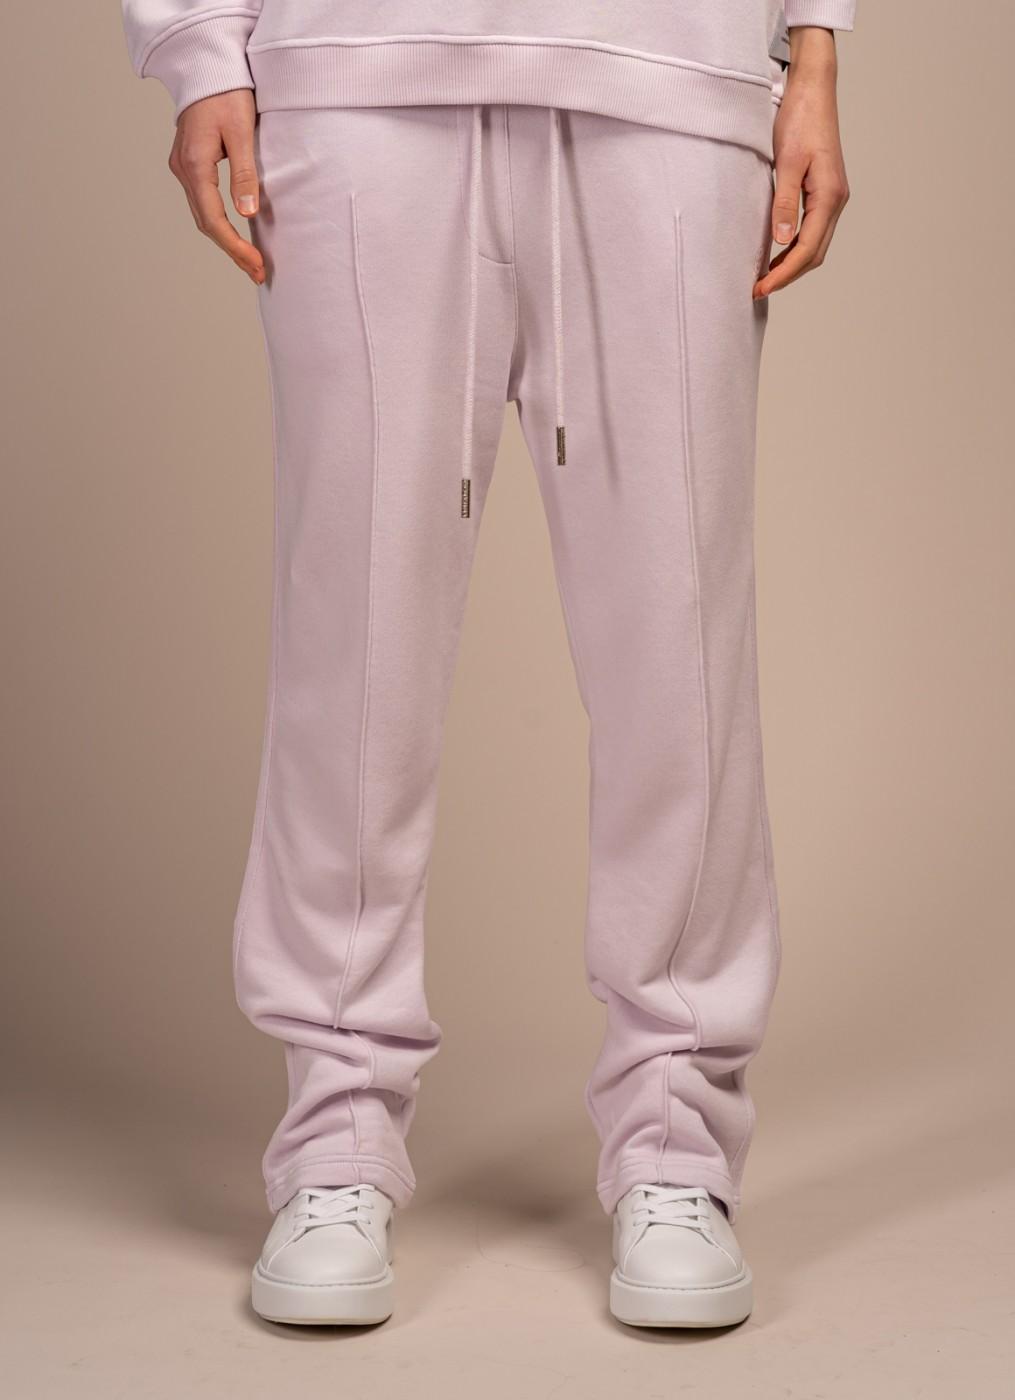 ER Abby - pants